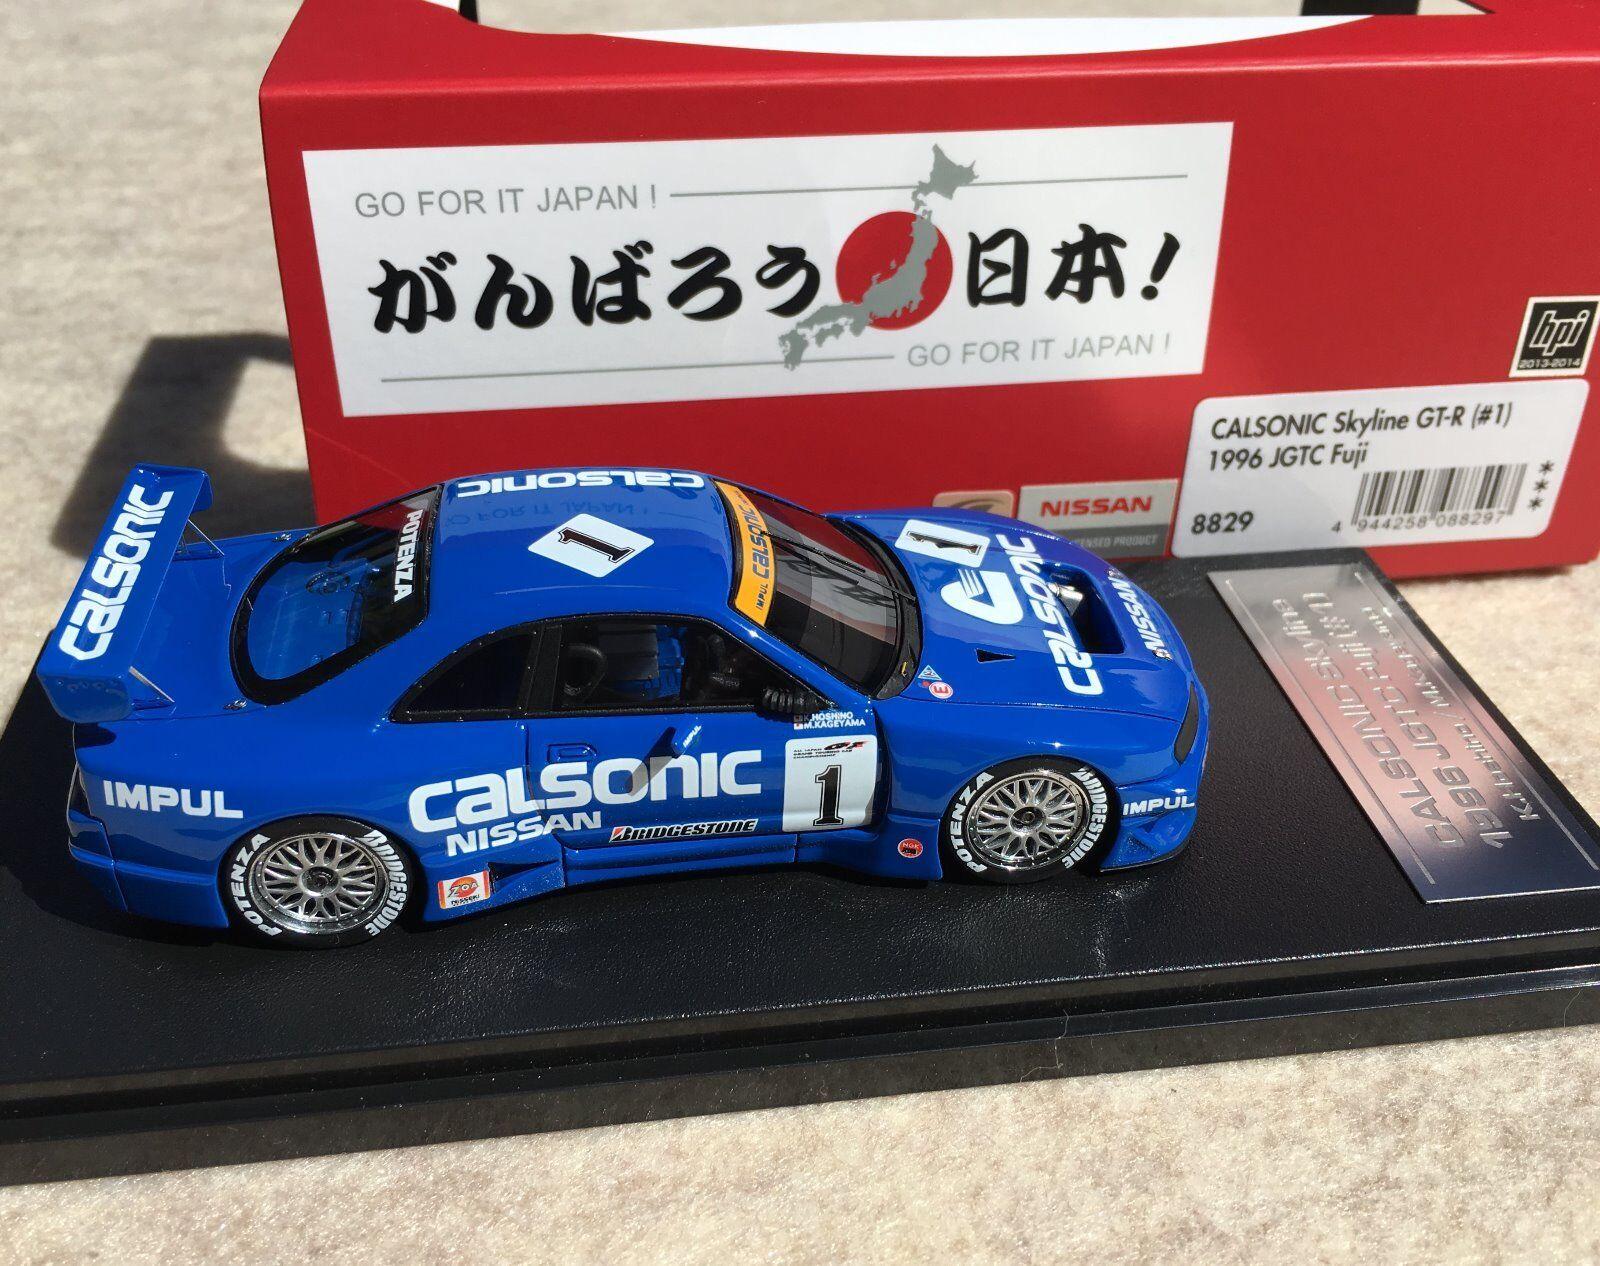 Calsonic skyline gt - r   1 1996 jgtc fuji - harz - hpi   8829 - 1   43